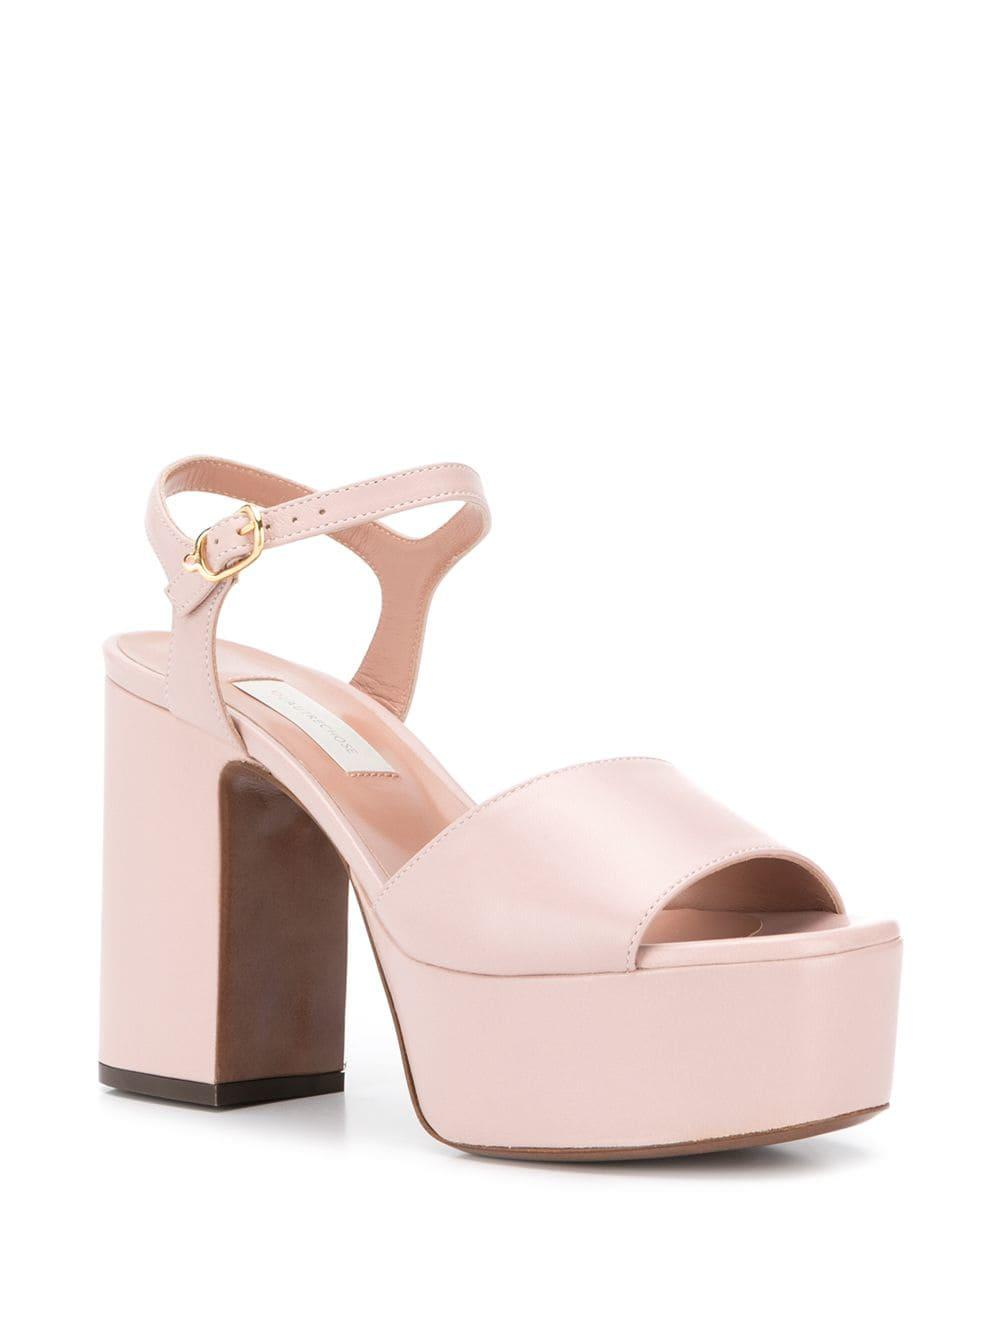 8a2c4249525 L Autre Chose - Pink Platform Open-toe Sandals - Lyst. View fullscreen